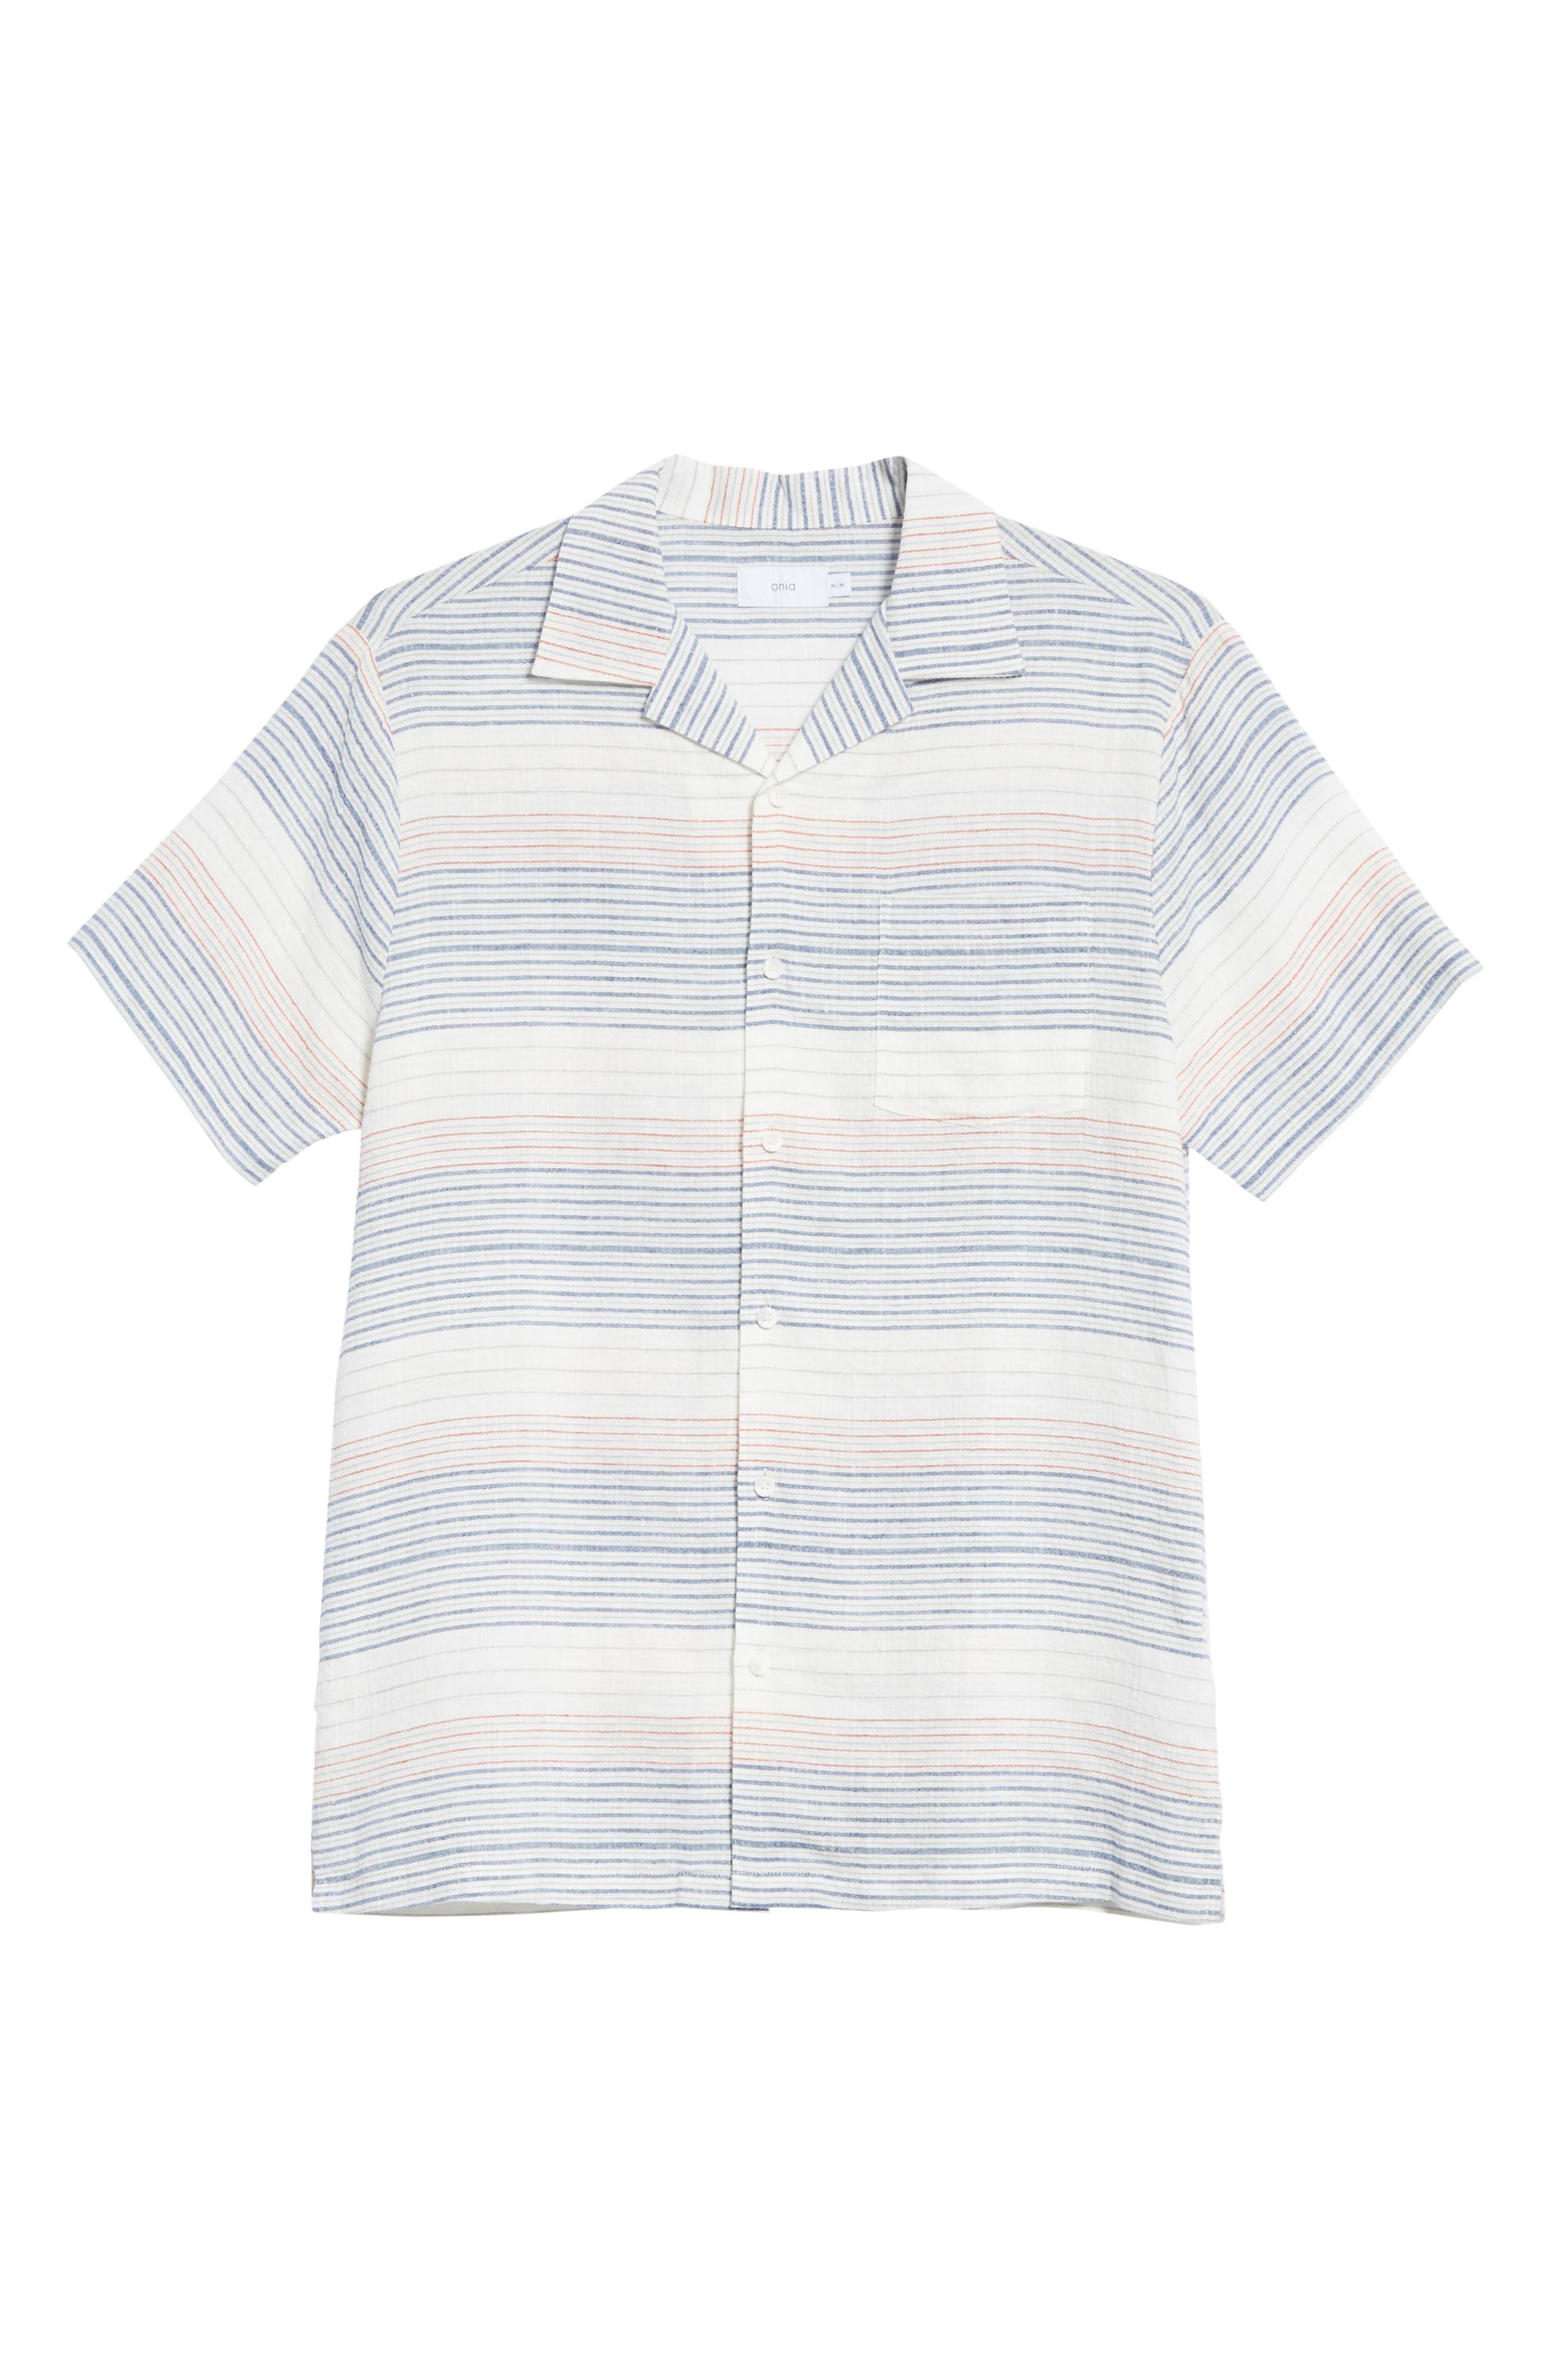 Americana Stripe Woven Camp Shirt,                             Alternate thumbnail 6, color,                             960